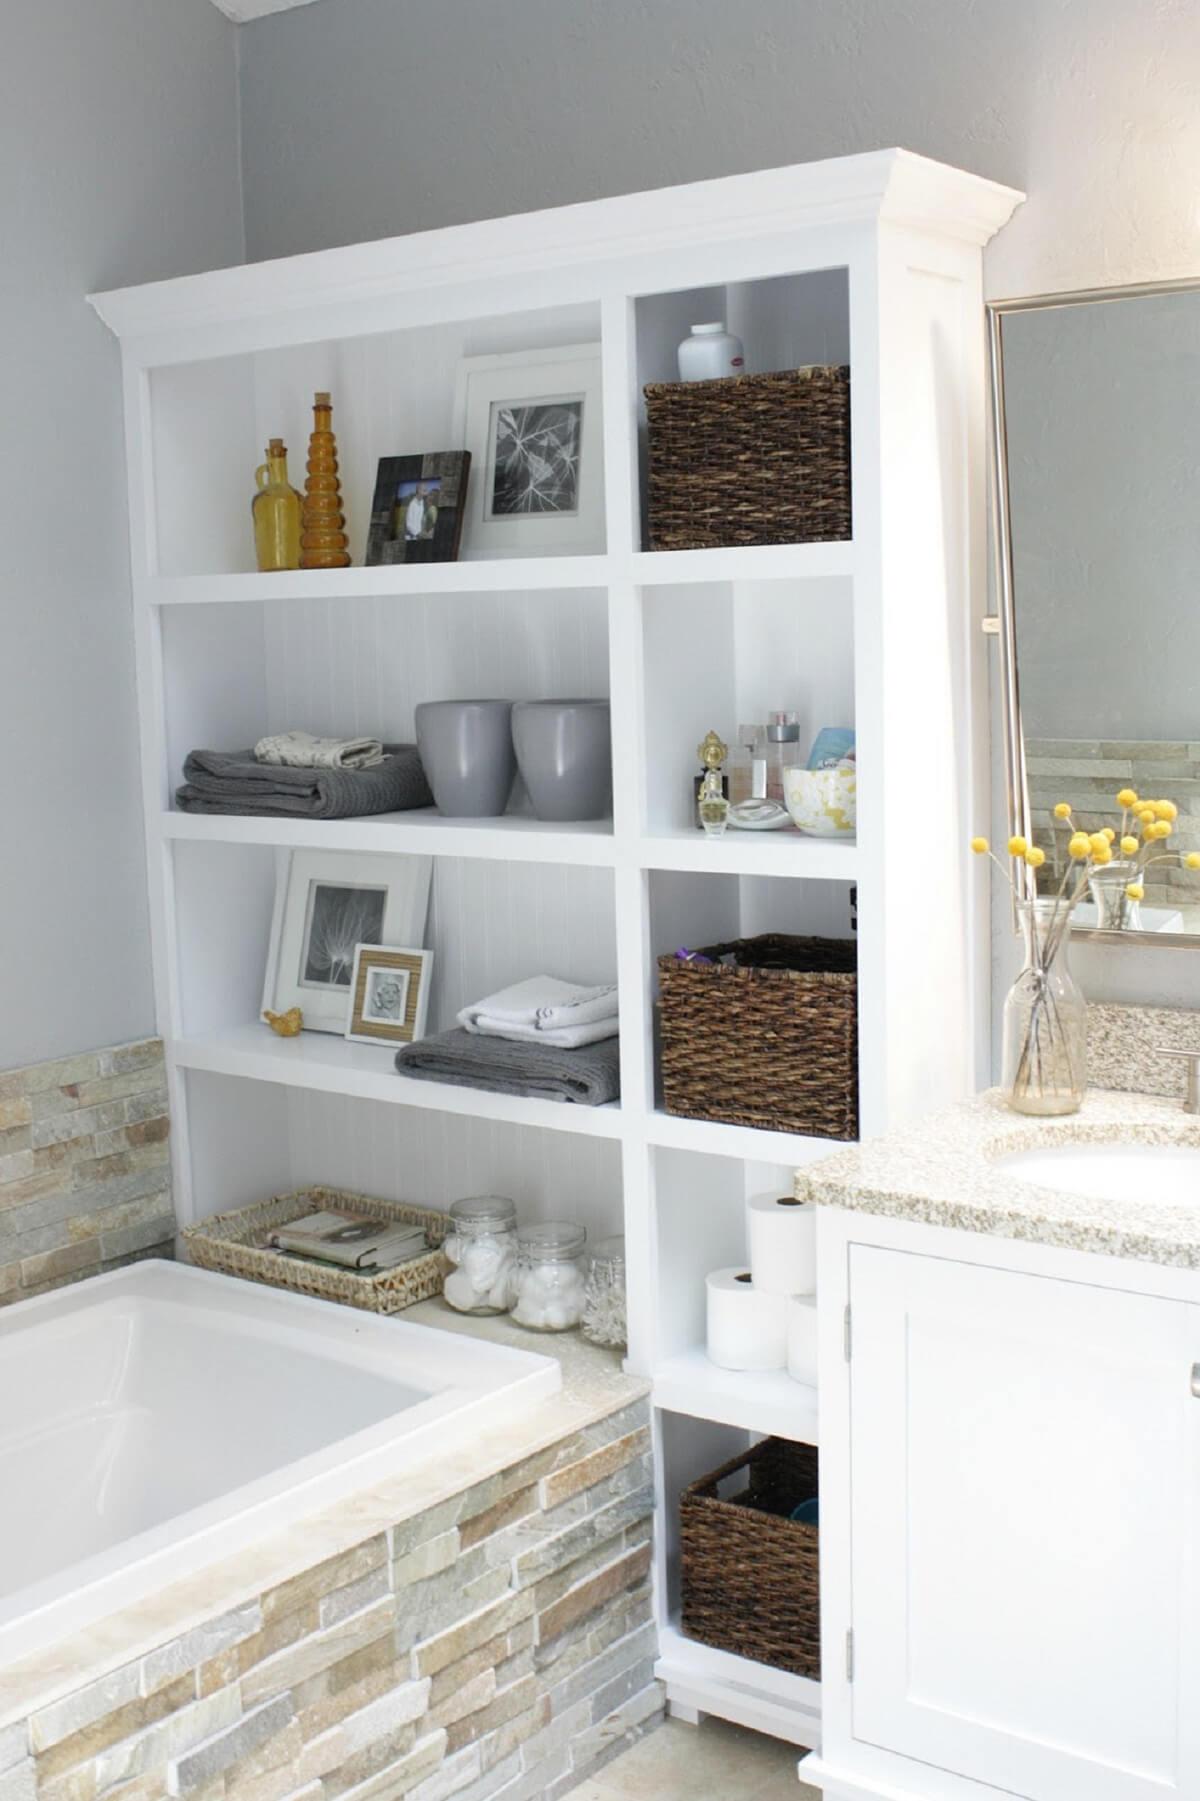 bathroom storage ideas for small bathrooms 28. re-purpose that old bookshelf UOOVINW